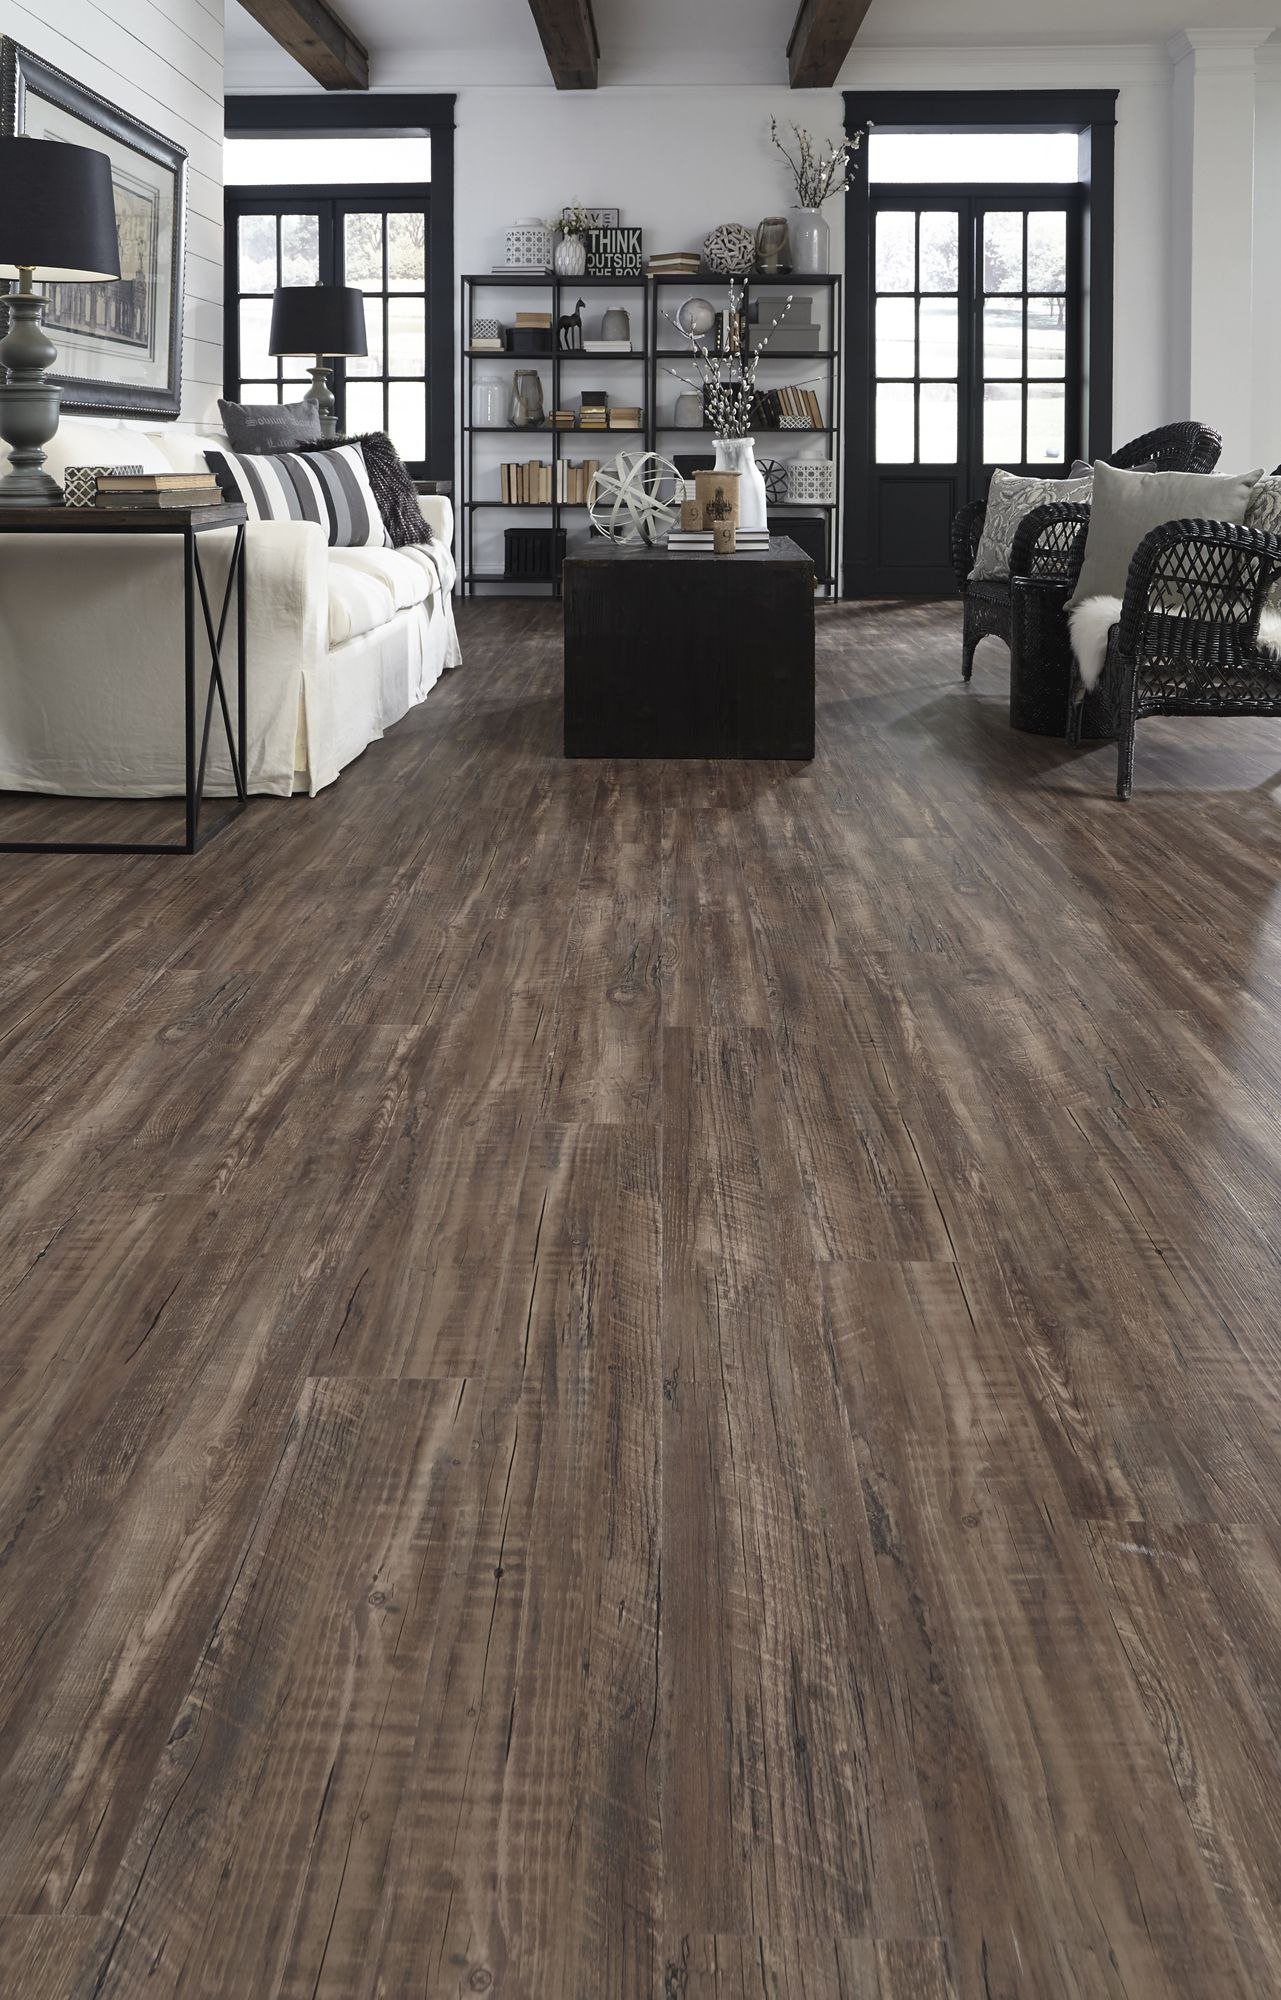 Rustic Reclaimed Oak waterproof luxury vinyl plank